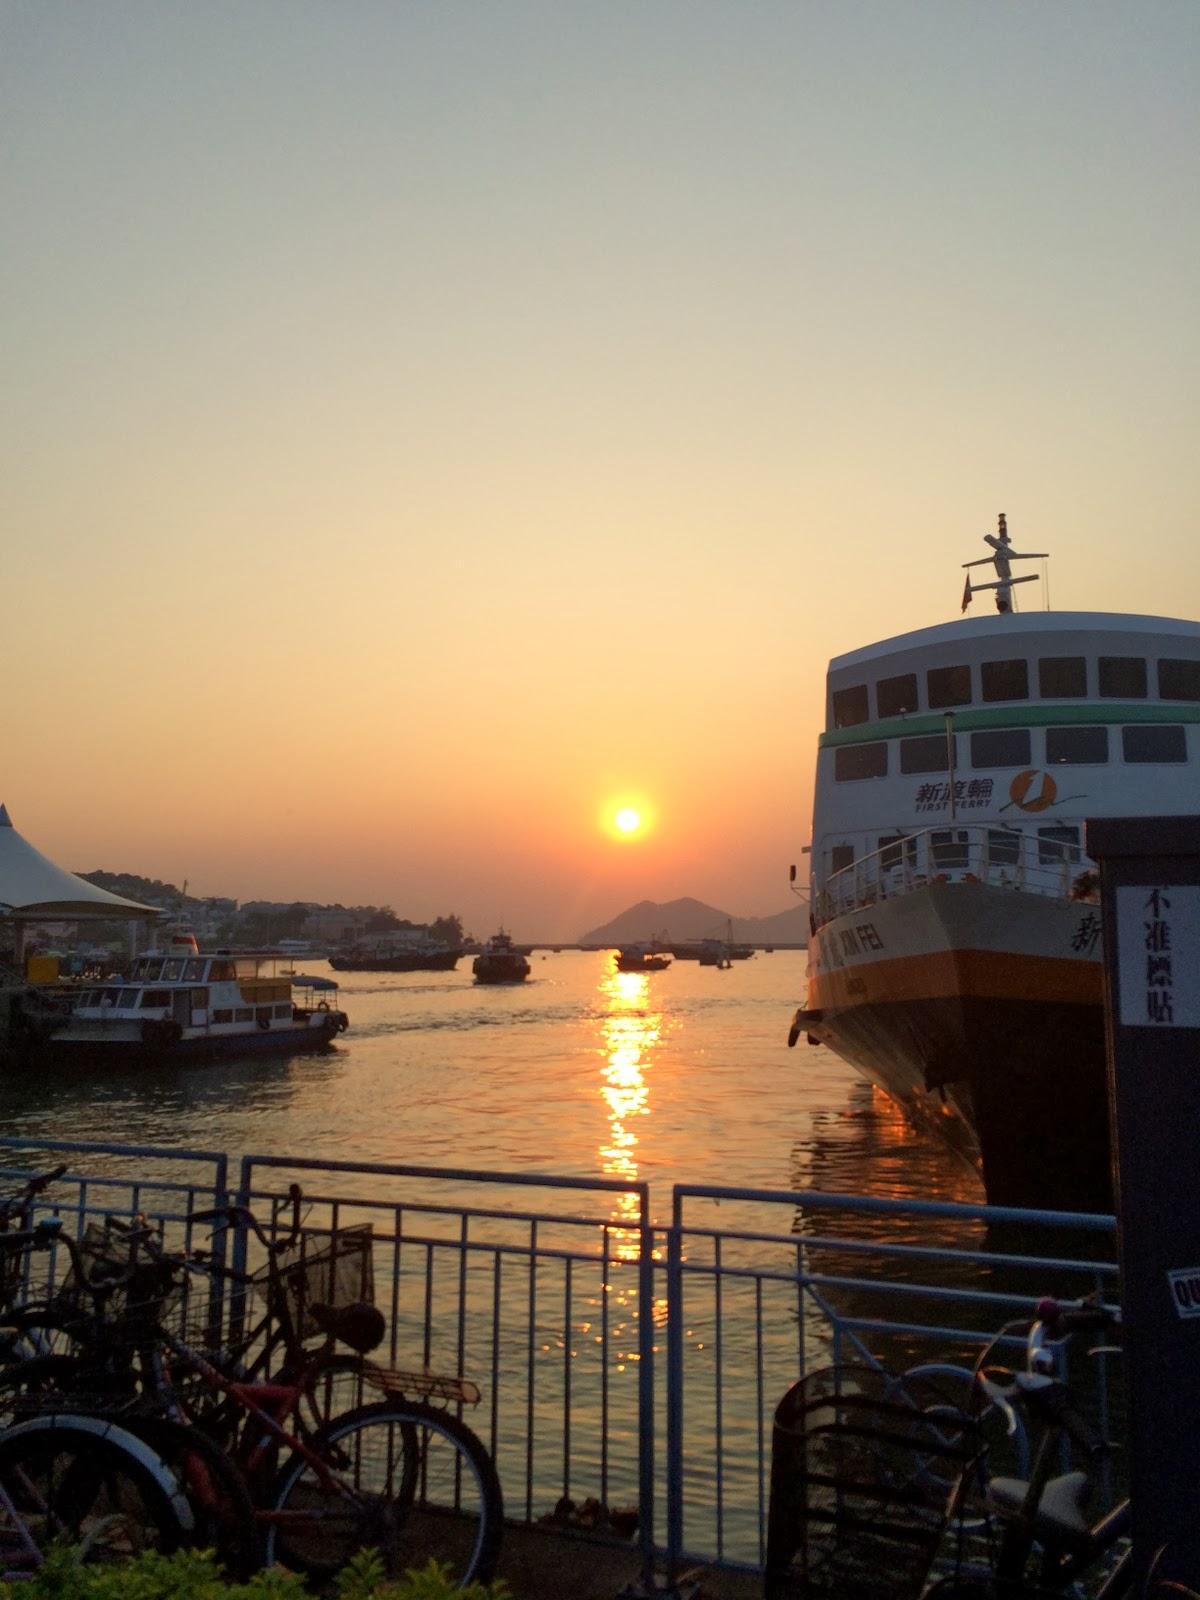 Heem家blog: 長洲華威酒店2日1夜開心之旅